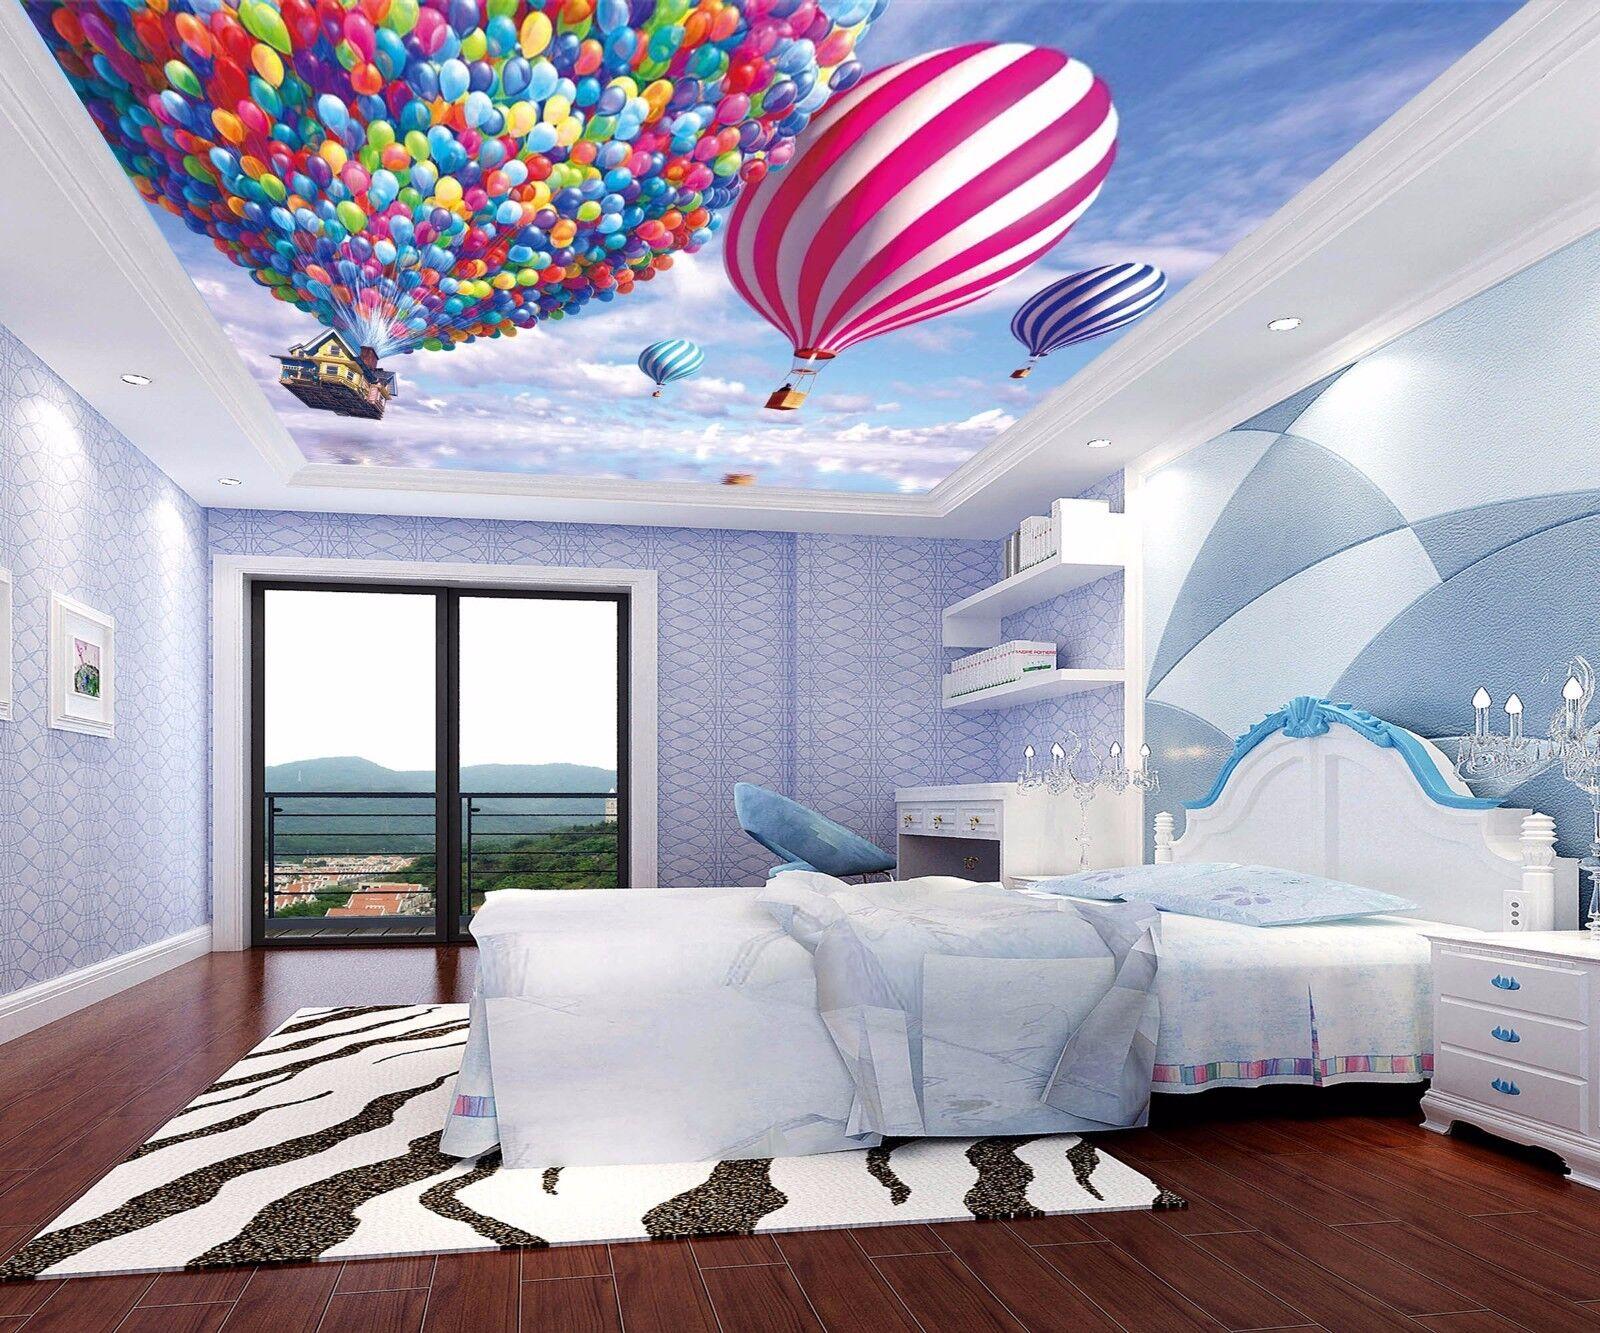 3D Balloon Hut 83 Ceiling WallPaper Murals Wall Print Decal Deco AJ WALLPAPER GB